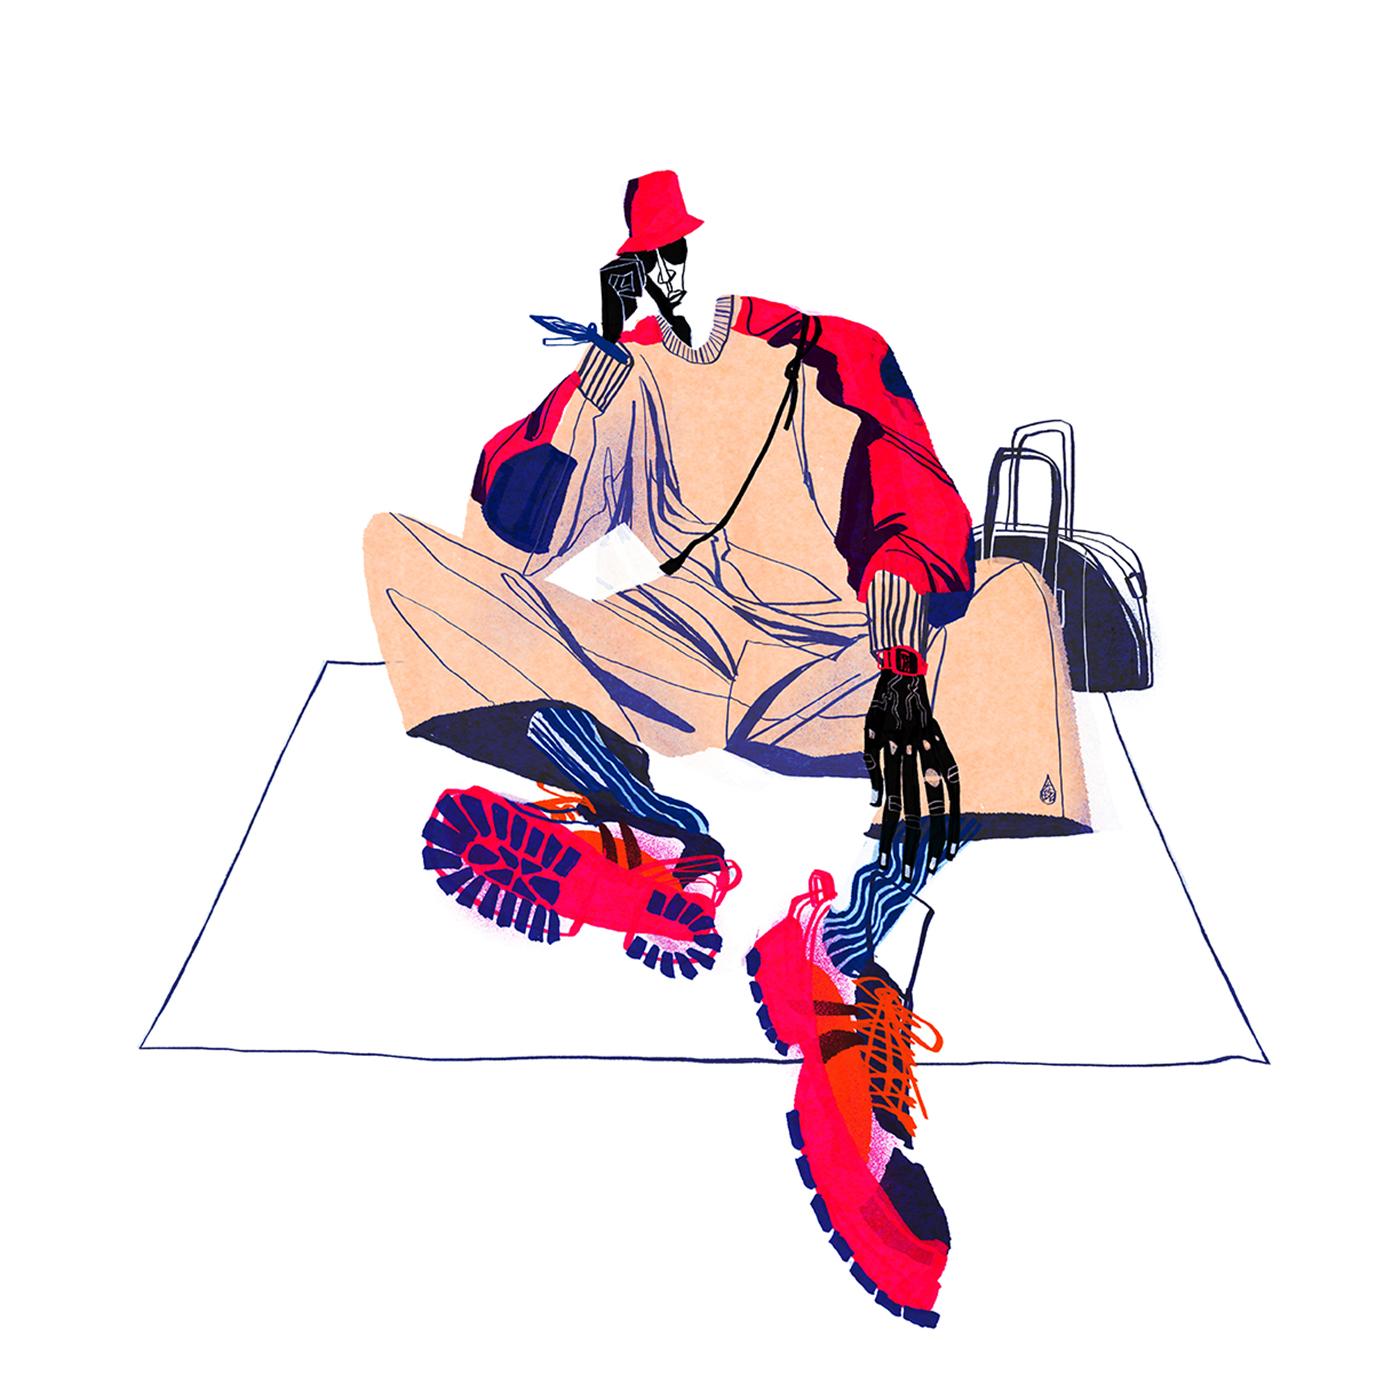 Richard Solomon - High-Res-Daren-Lin-023-Fashiongallery_2020